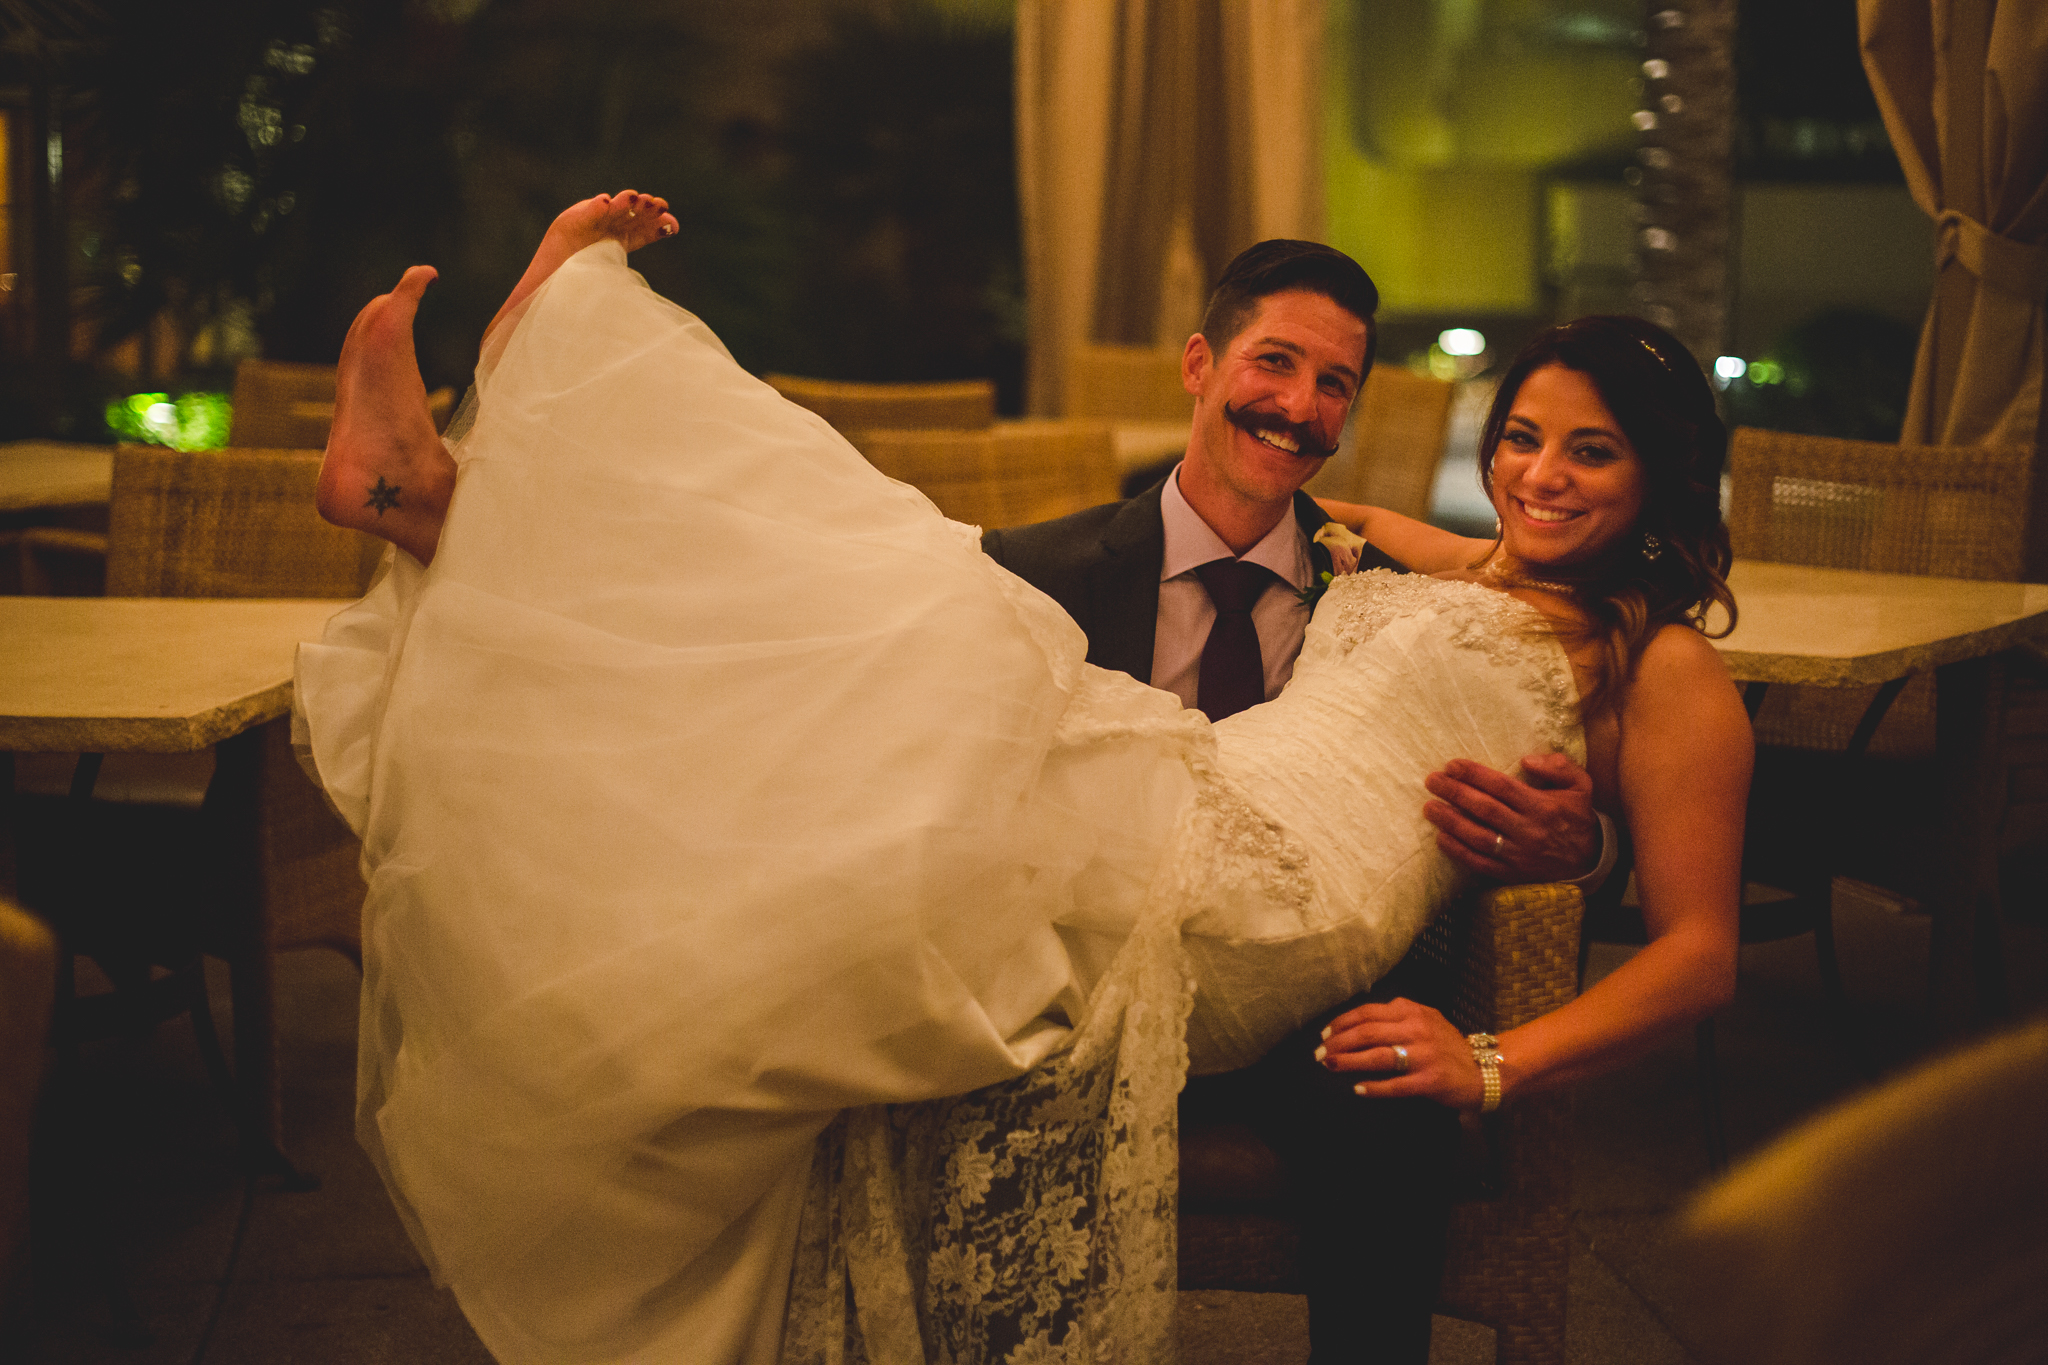 lc phoenix bride kicks her feet up in the air